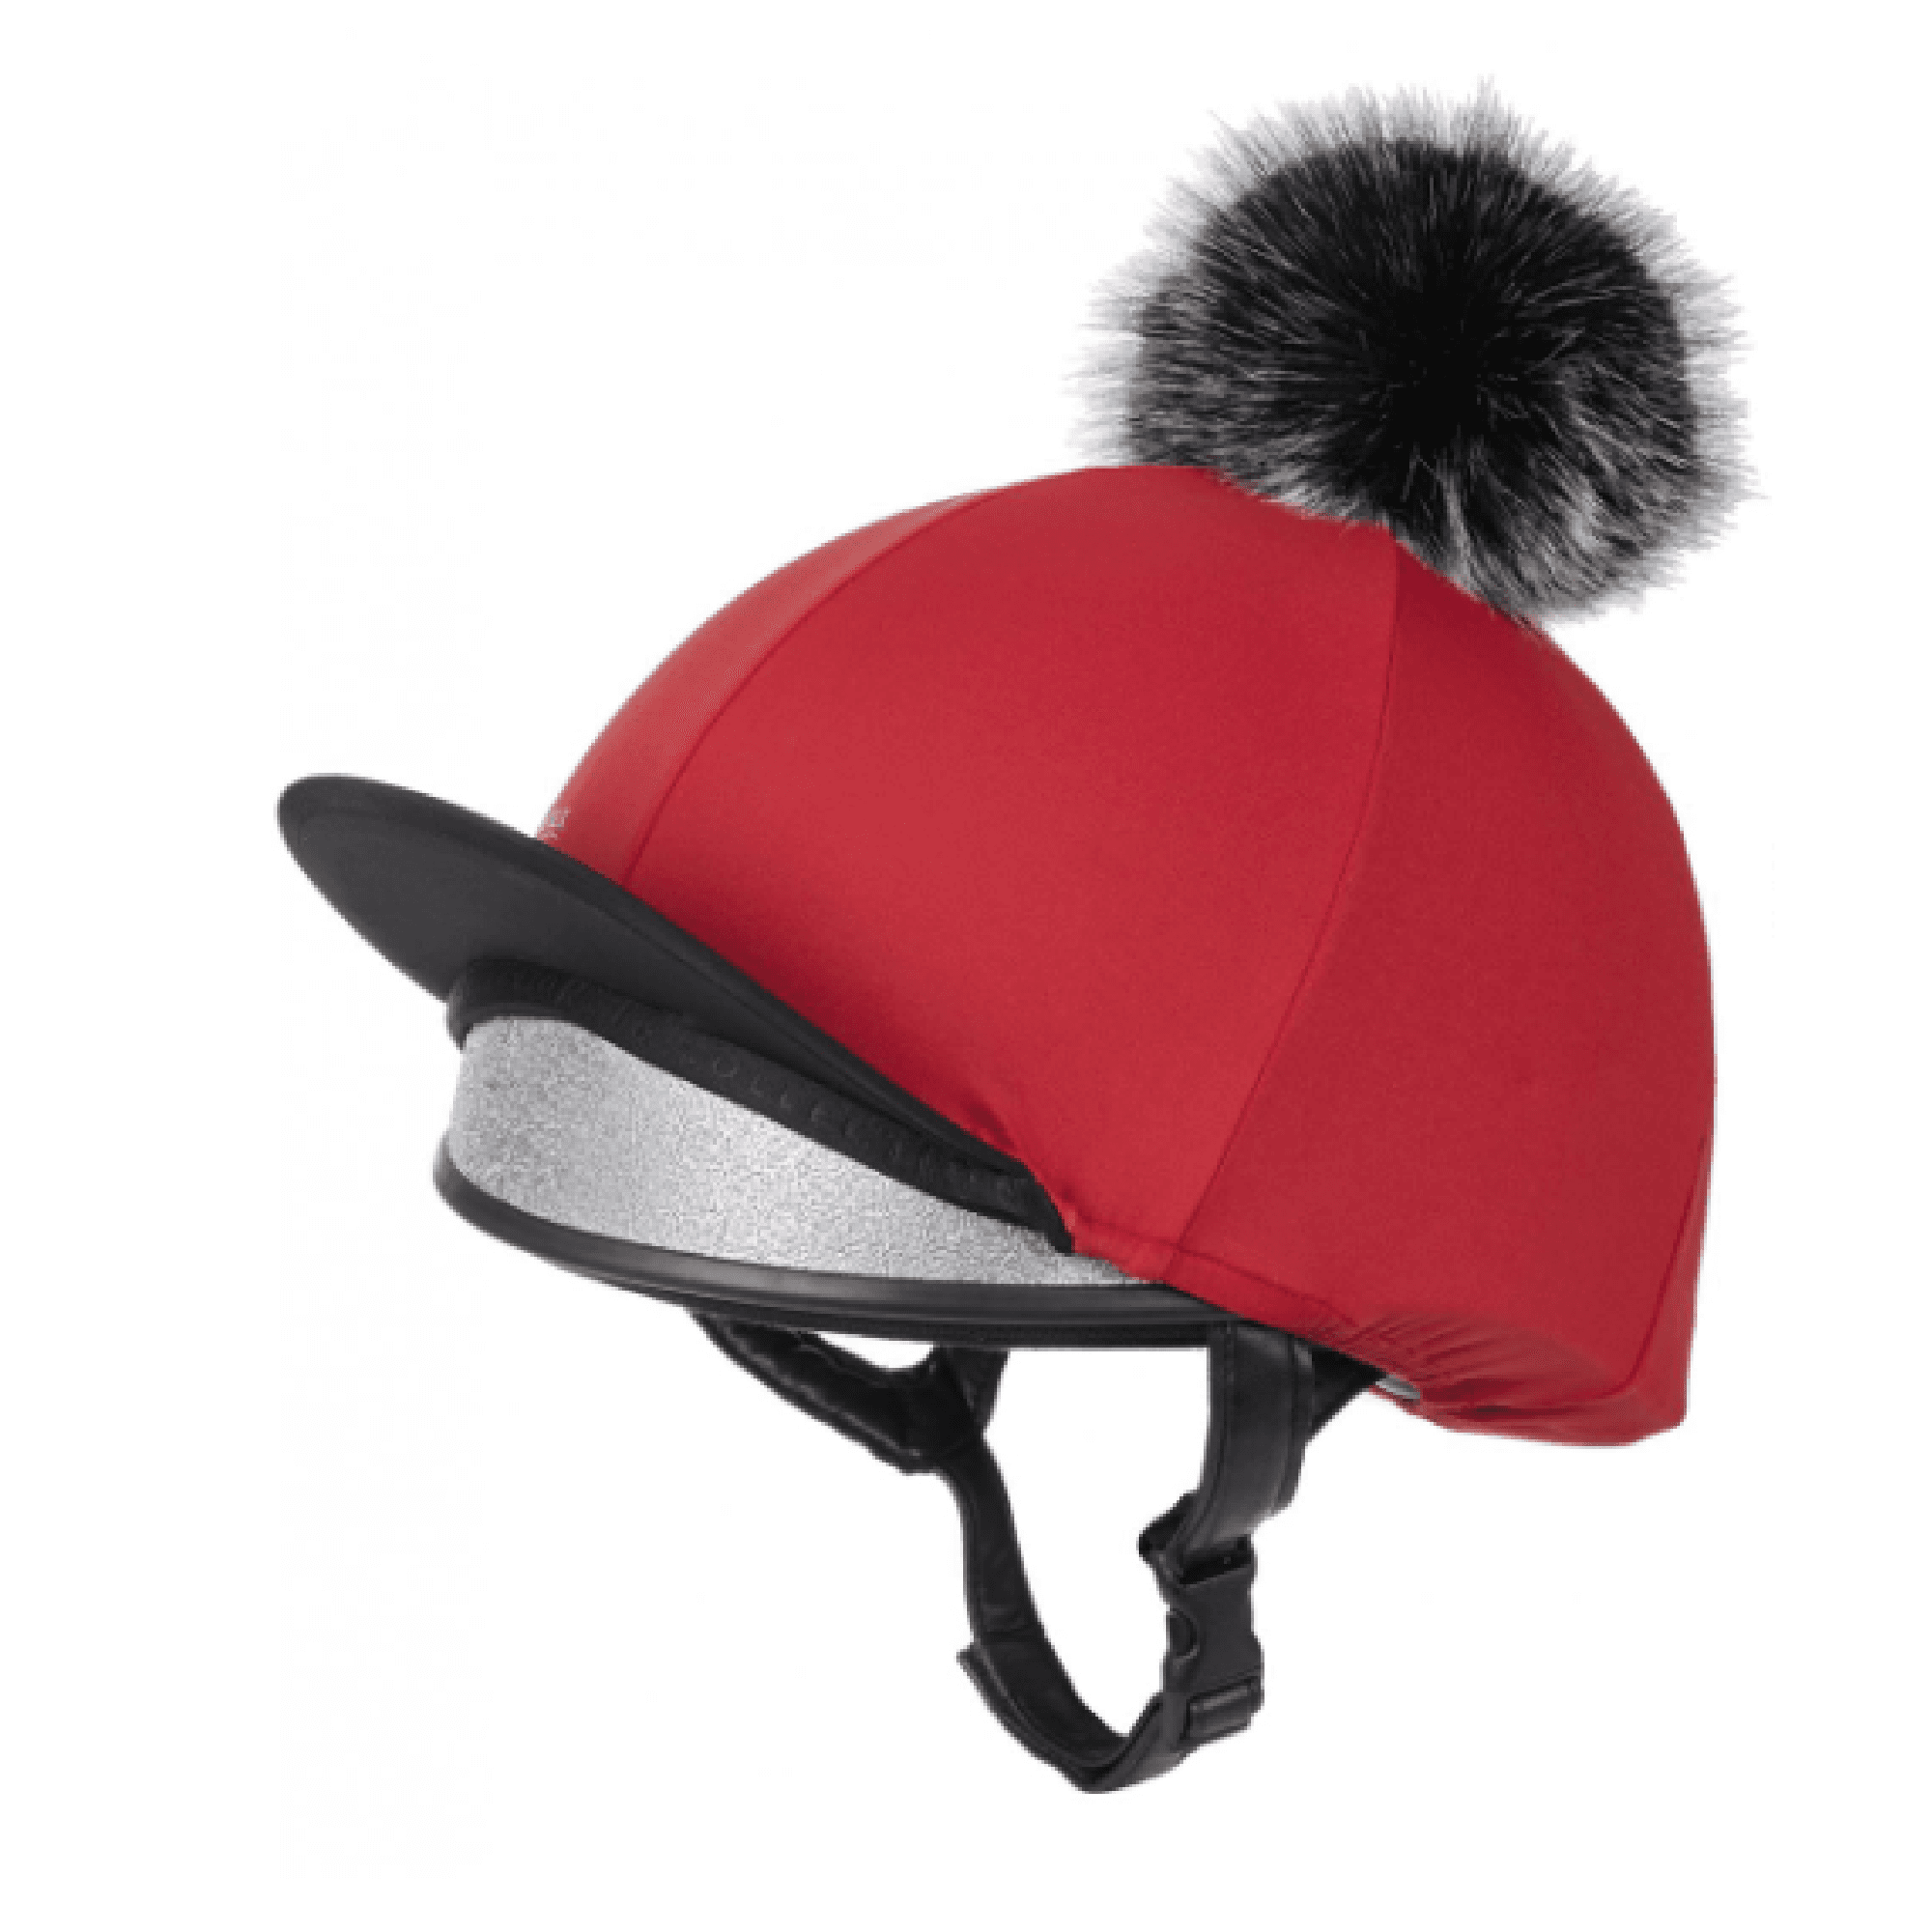 My-LeMieux-Hat-Silk-Luxury-Skull-Riding-Hat-Silk-Cover-with-Detachable-Pom-Pom thumbnail 25